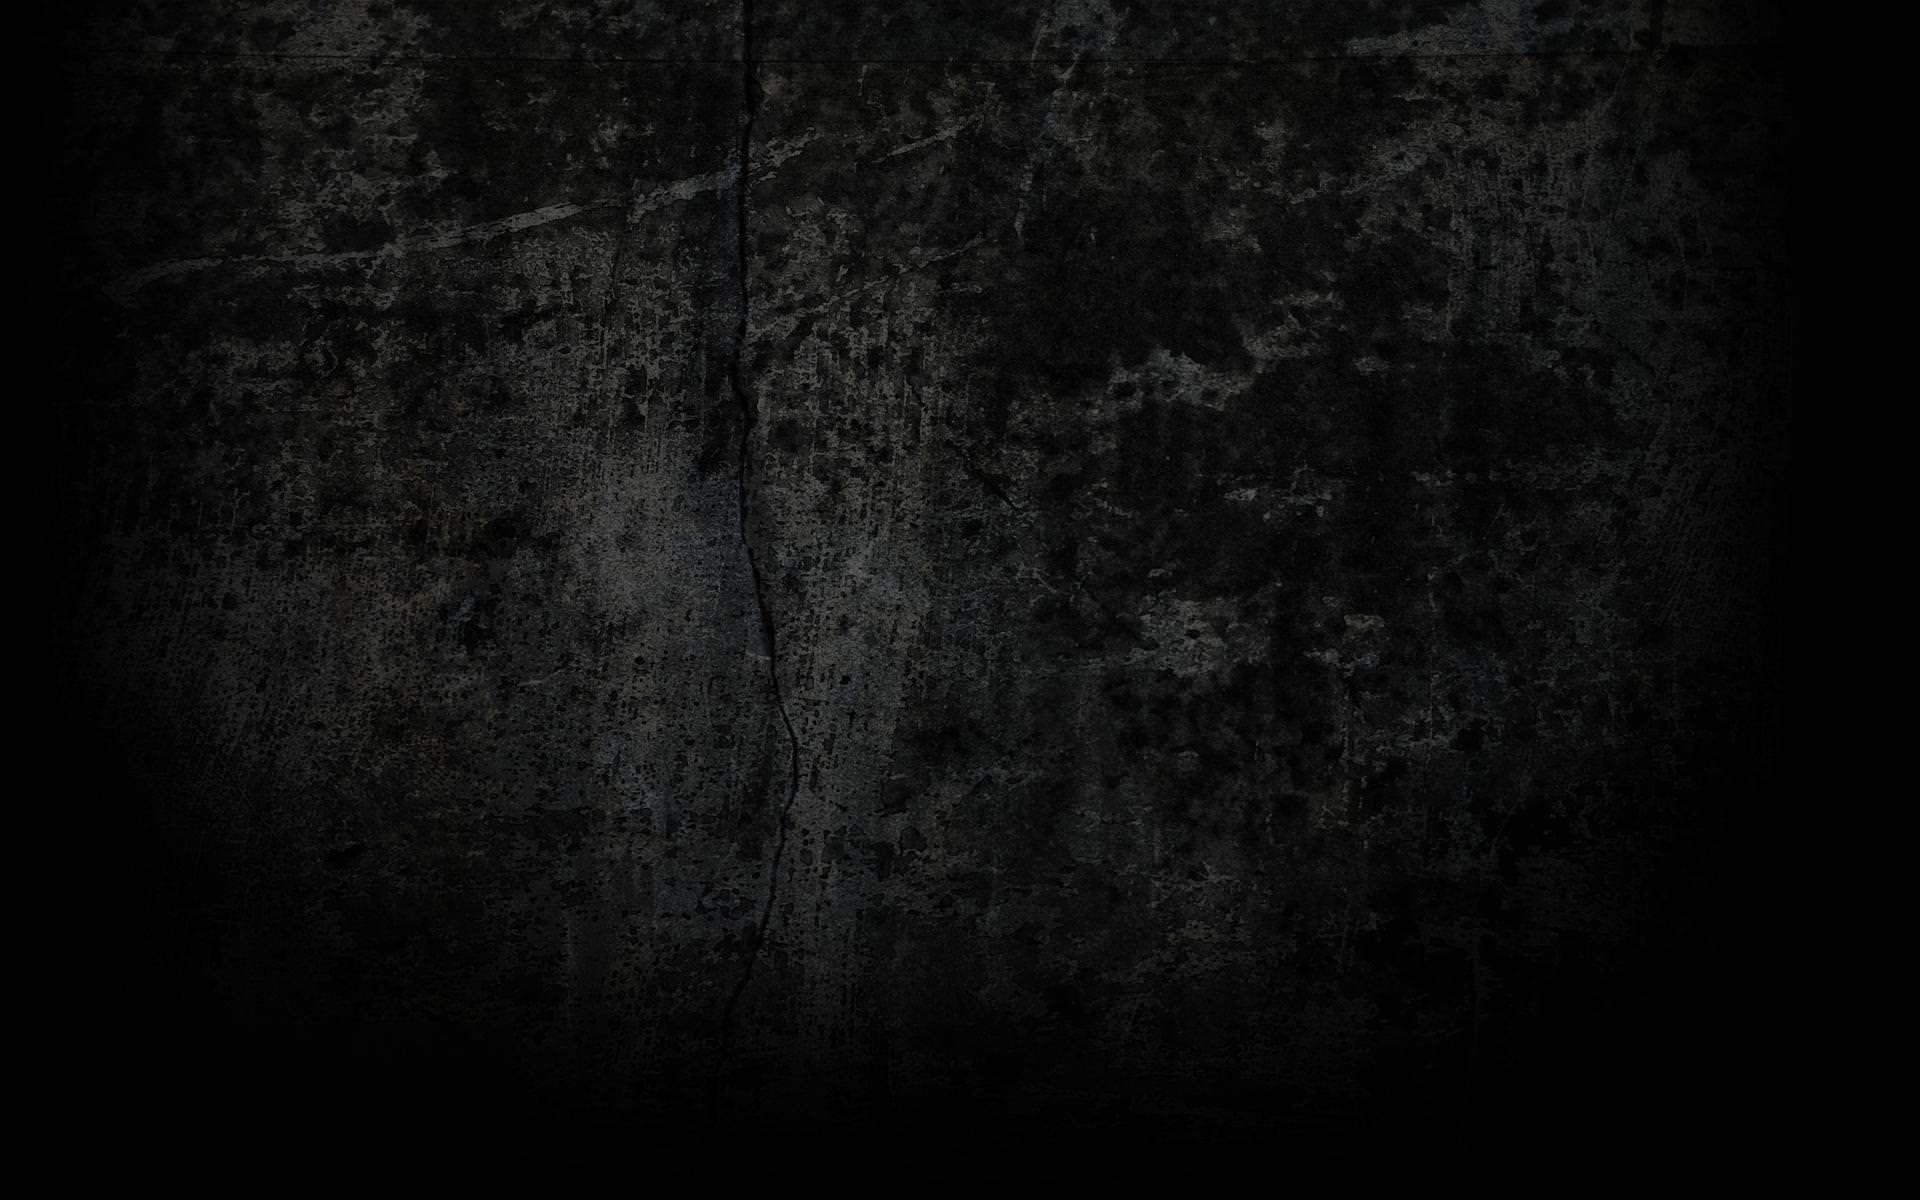 Grunge Effect Black Wallpaper for Website